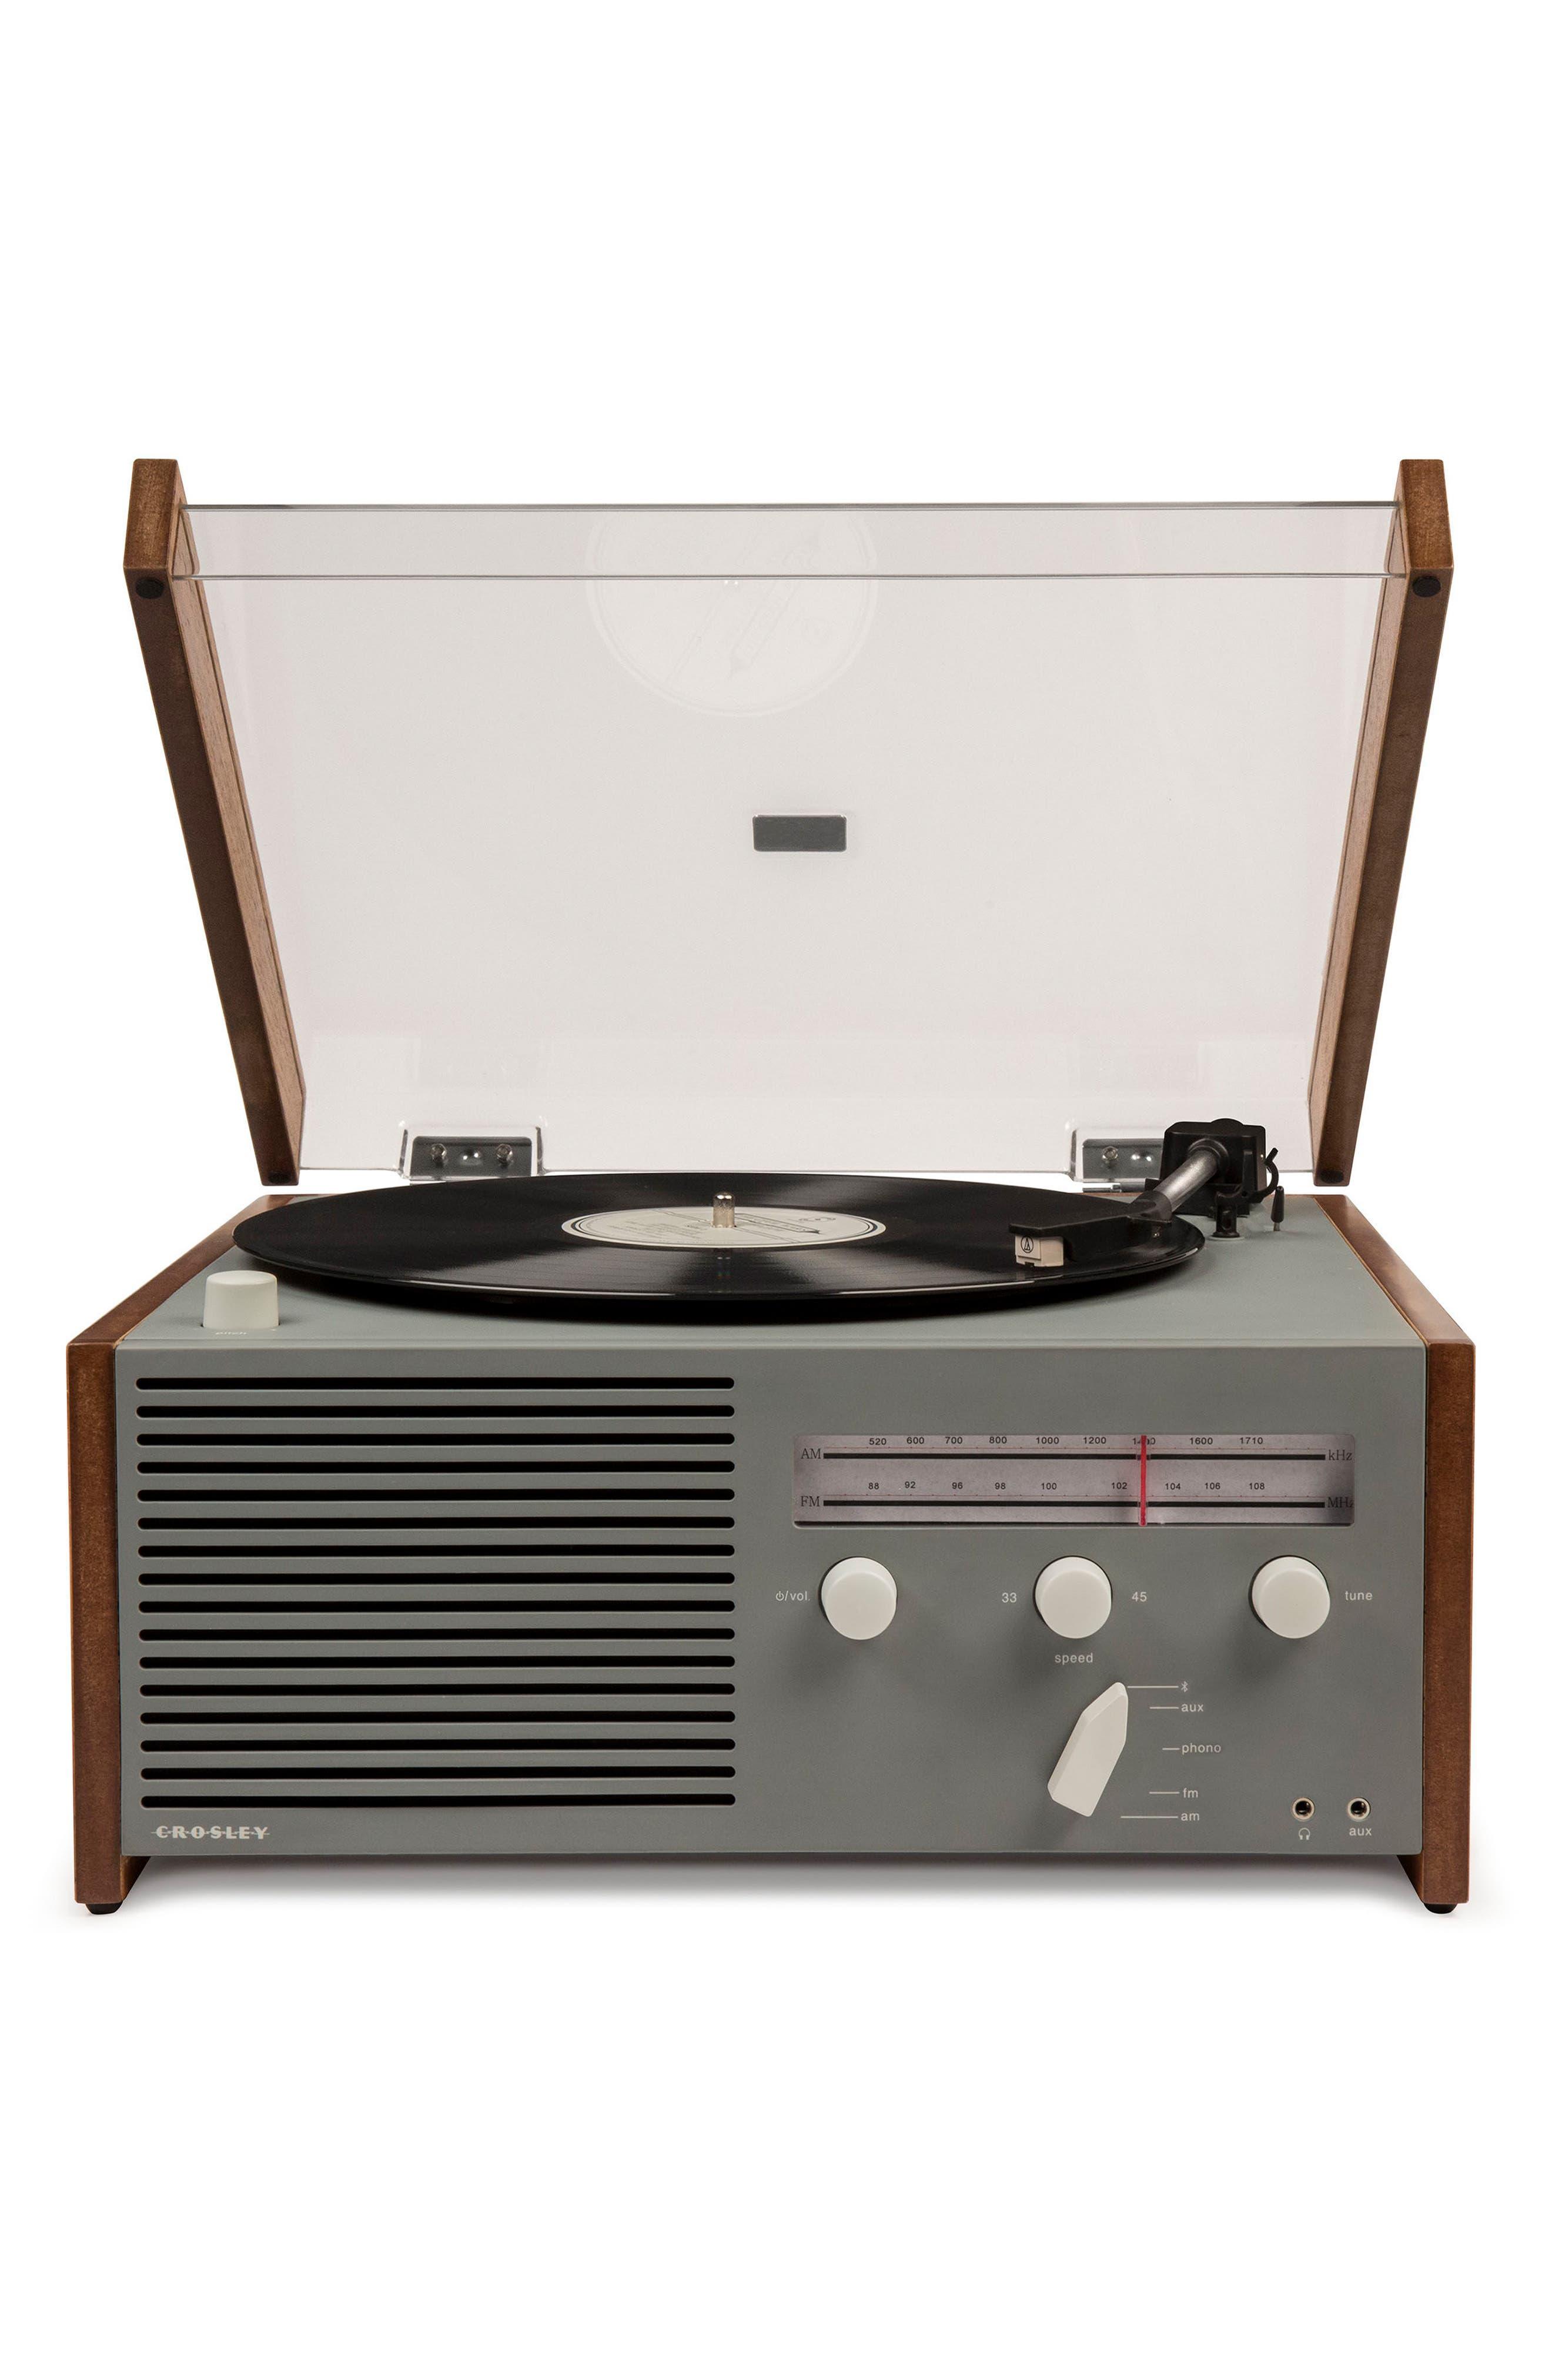 Alternate Image 1 Selected - Crosley Radio Otto 4-in-1 Turntable